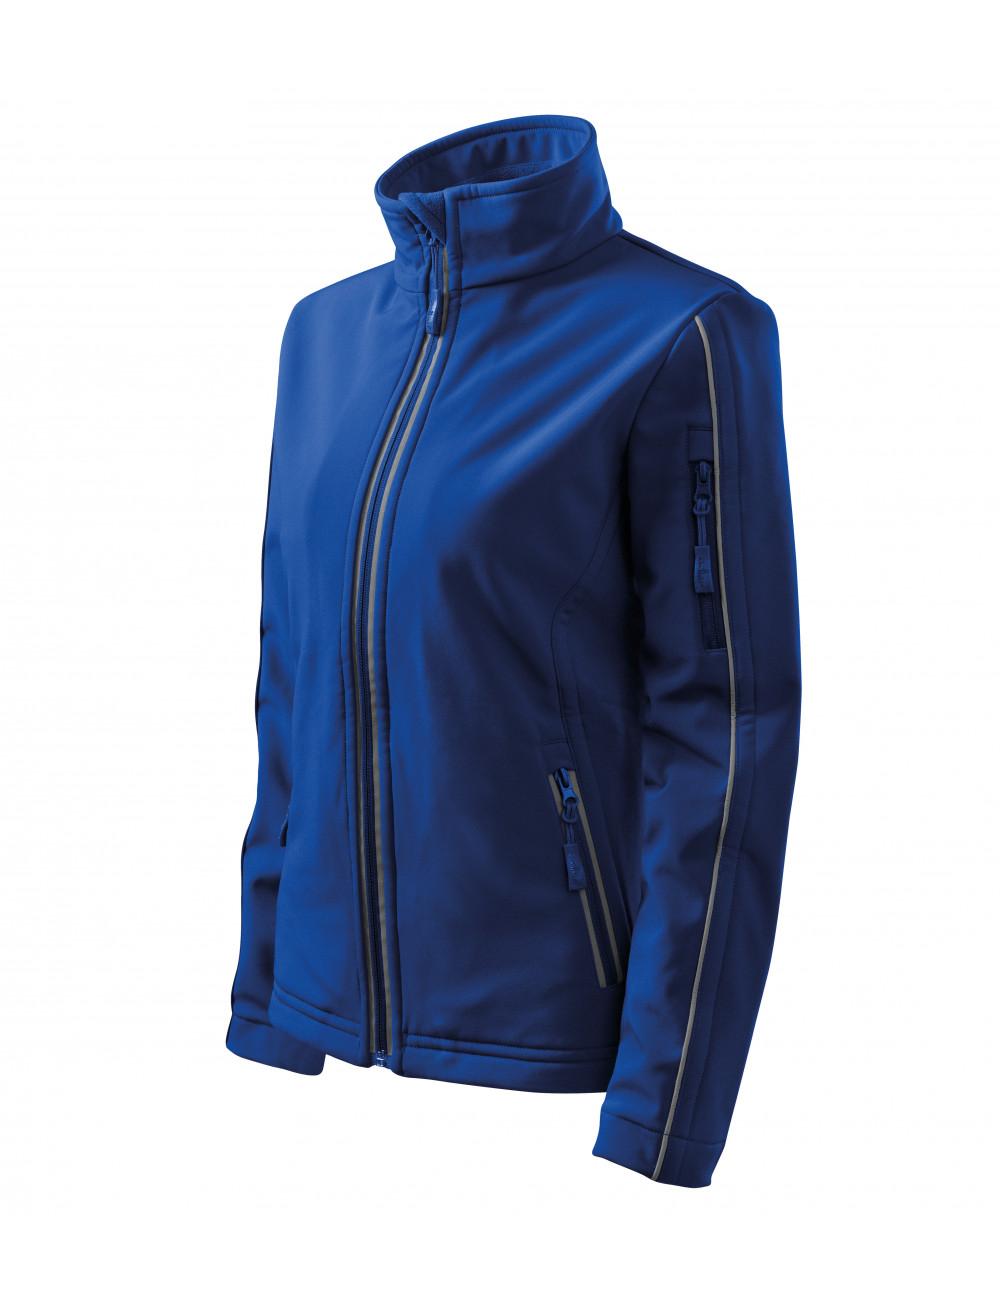 Adler MALFINI Kurtka damska Softshell Jacket 510 chabrowy